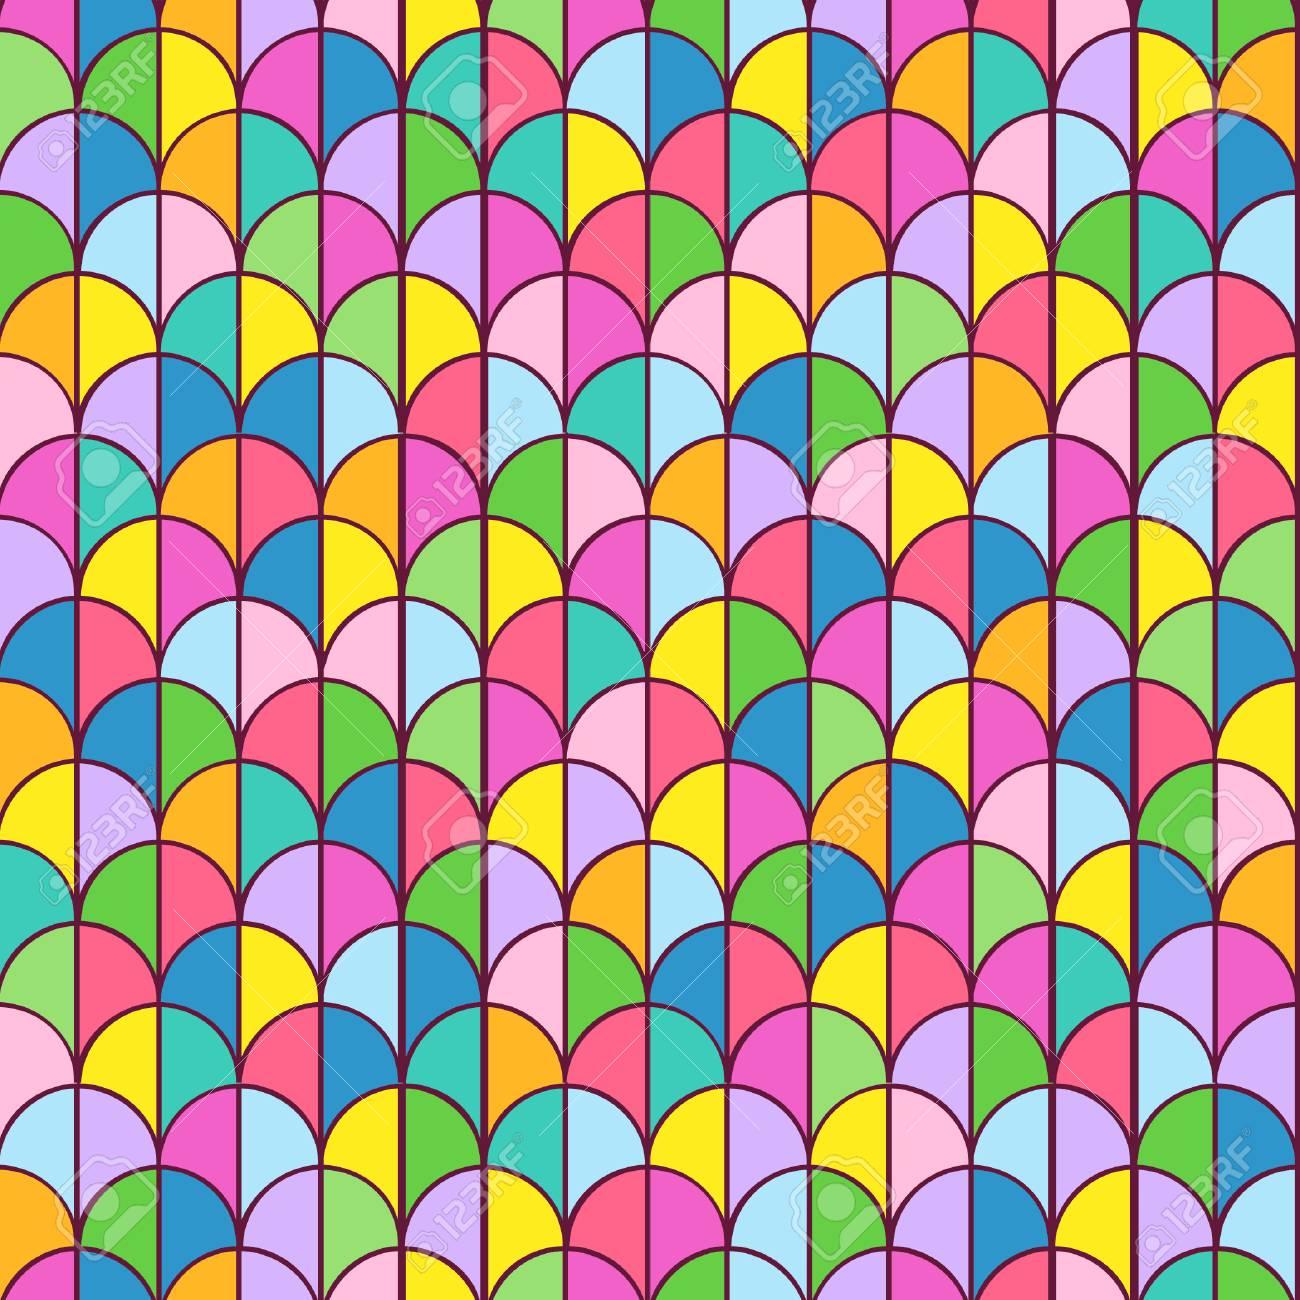 retro art deco seamless patterns design in 20 s style royalty free rh 123rf com art deco geometric pattern vector free art deco fan pattern vector